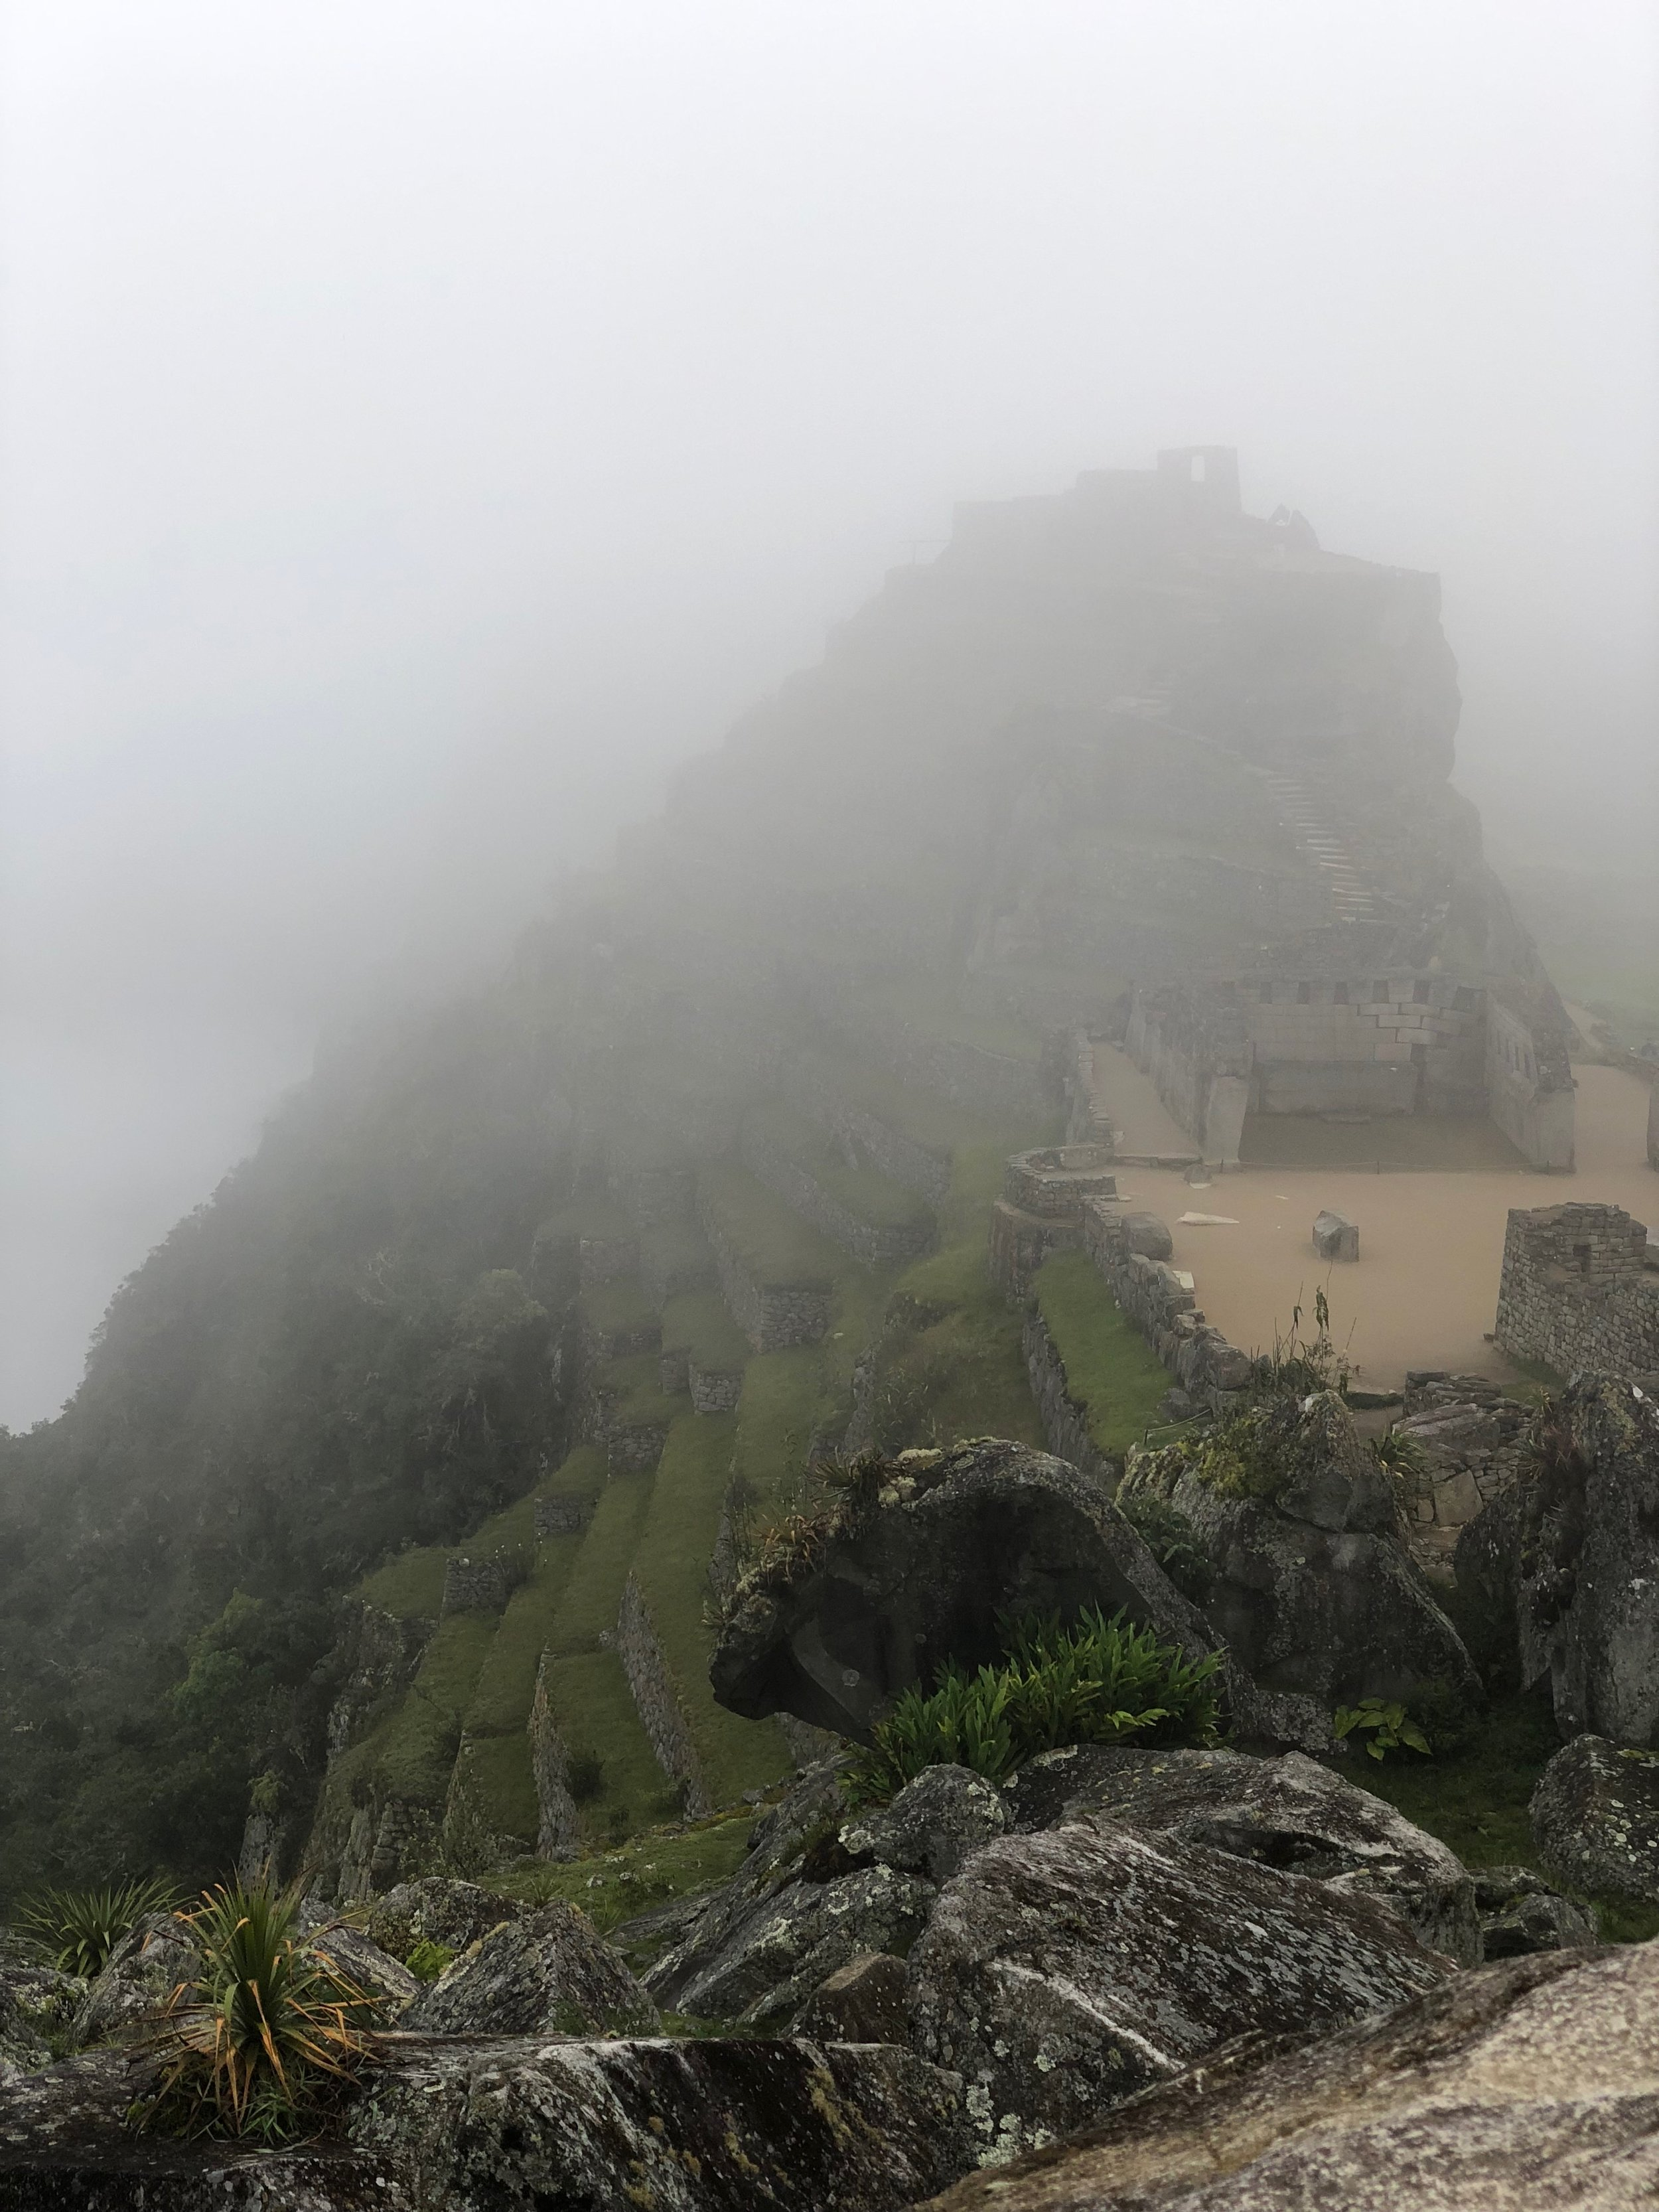 machu picchu - aguas calientes - south america - travel tips - fog